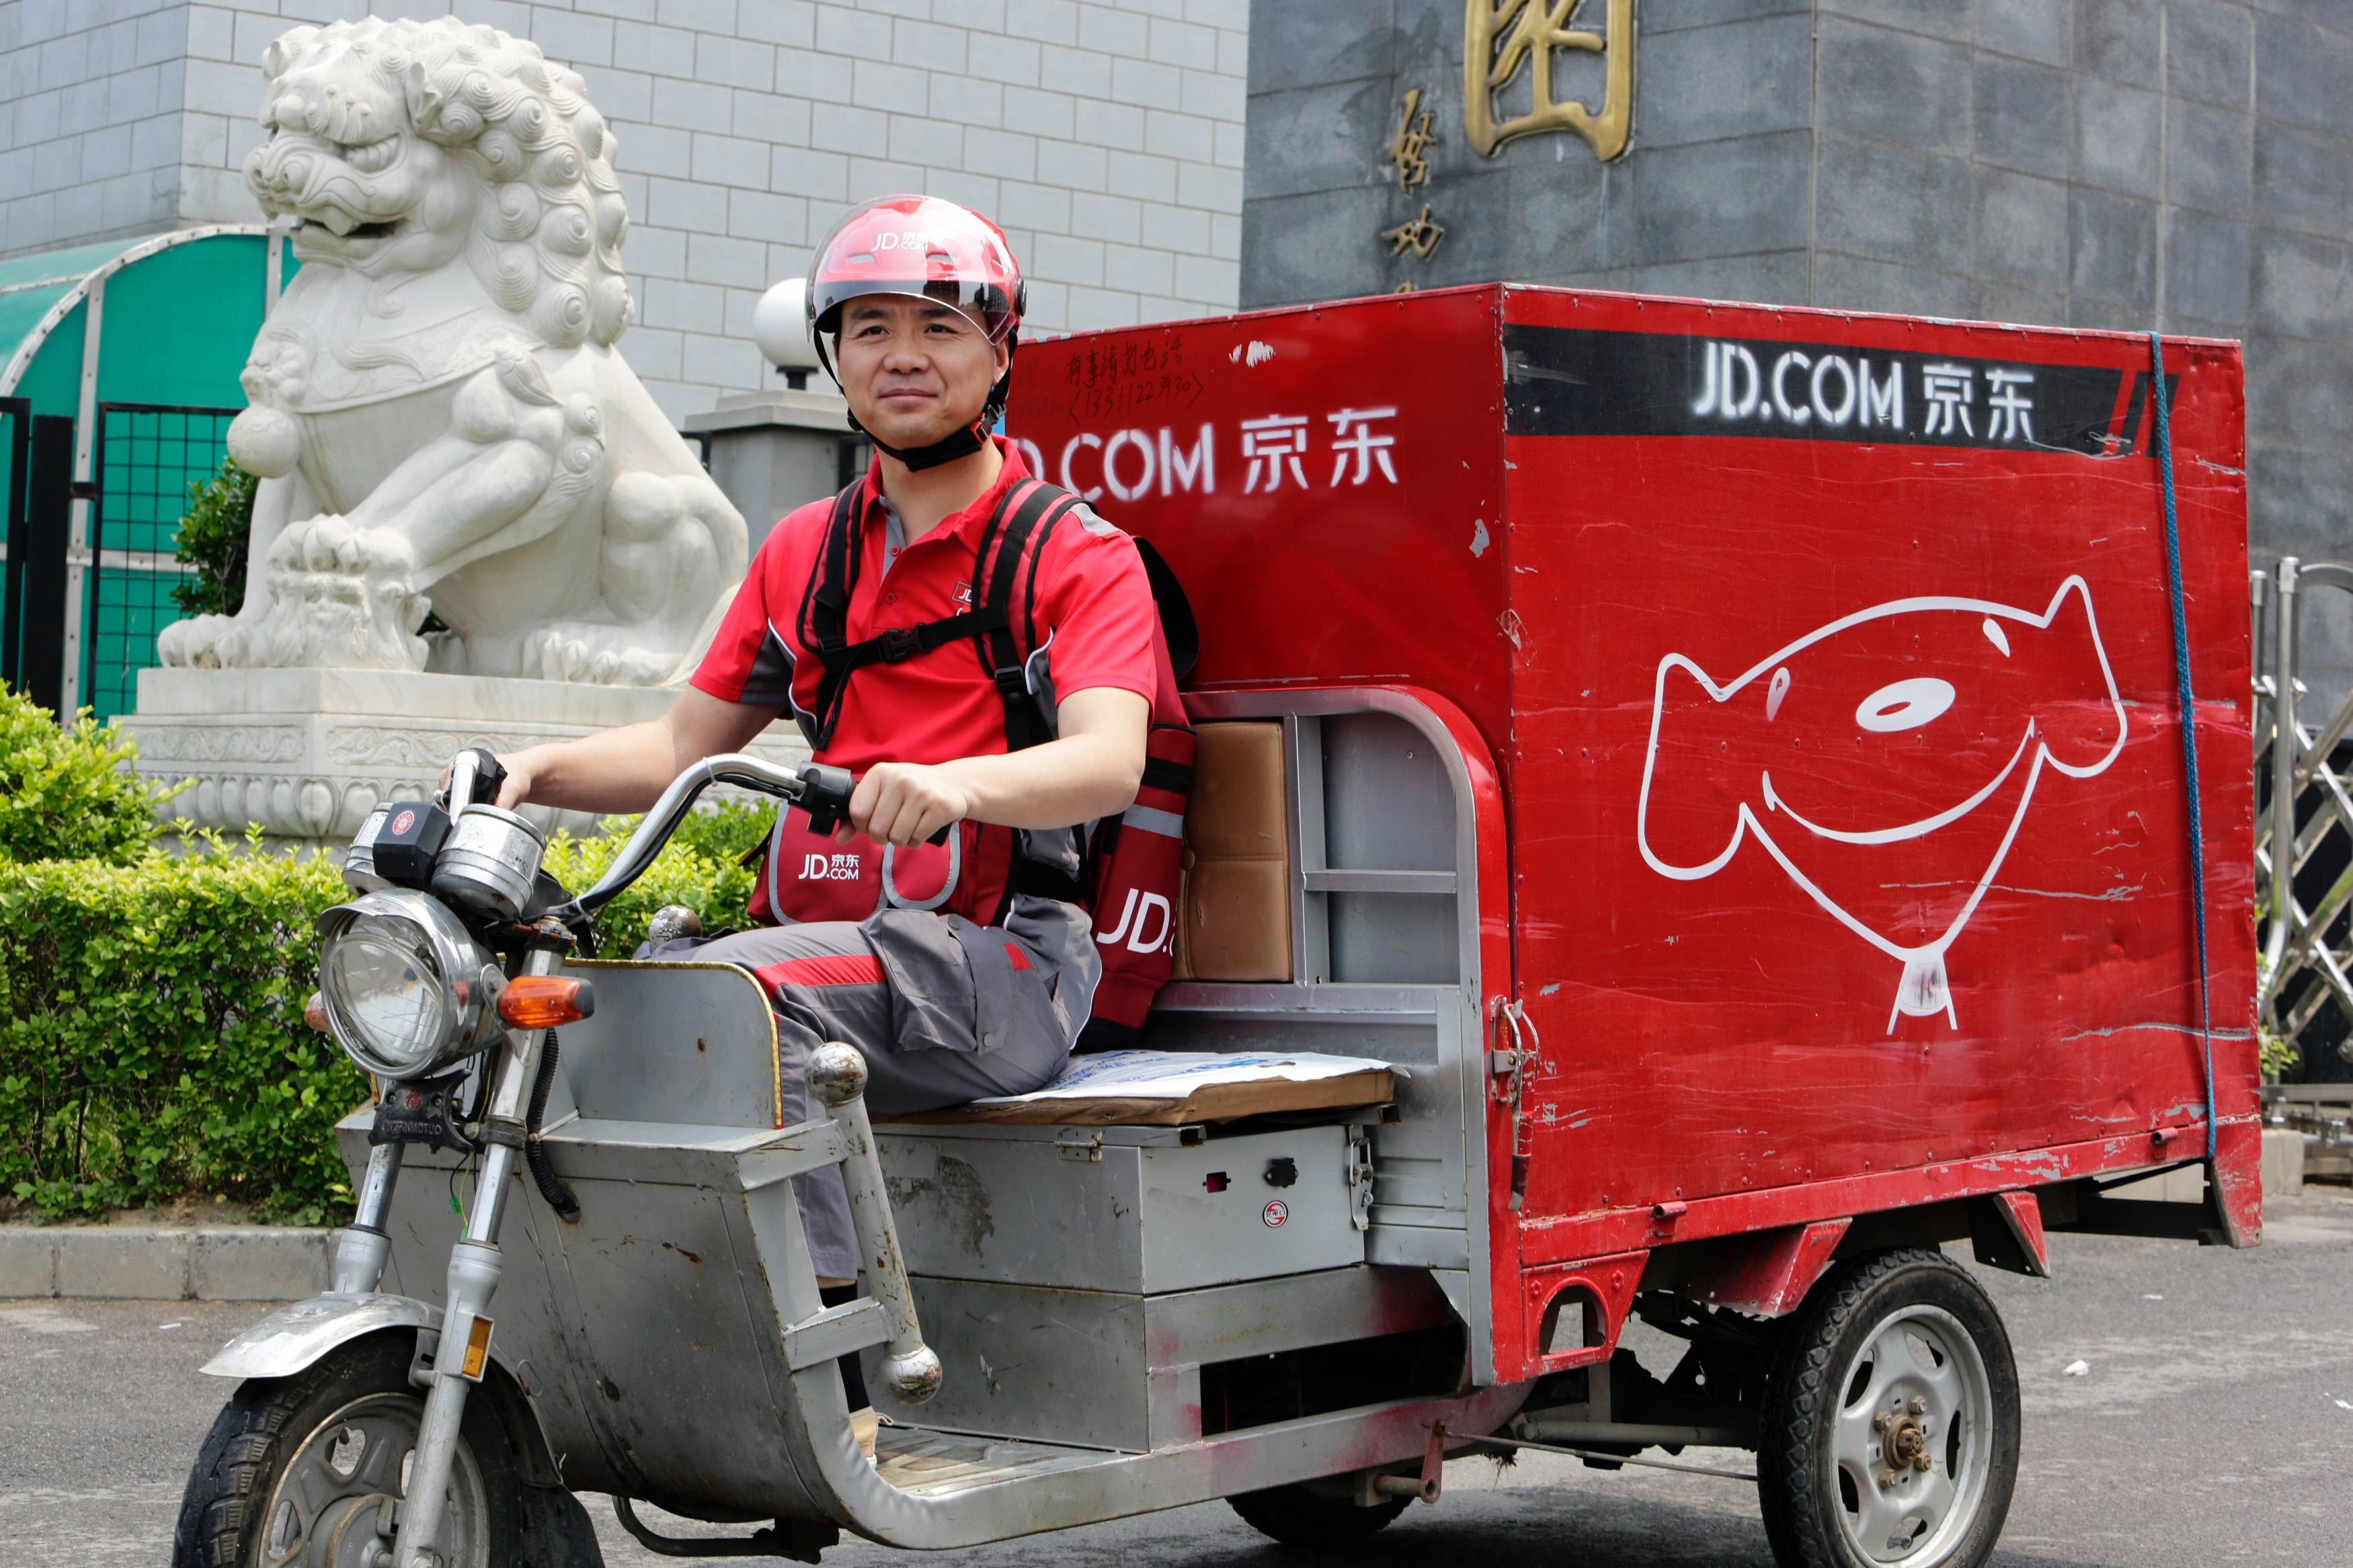 JD.com delivery   Source: Reuters